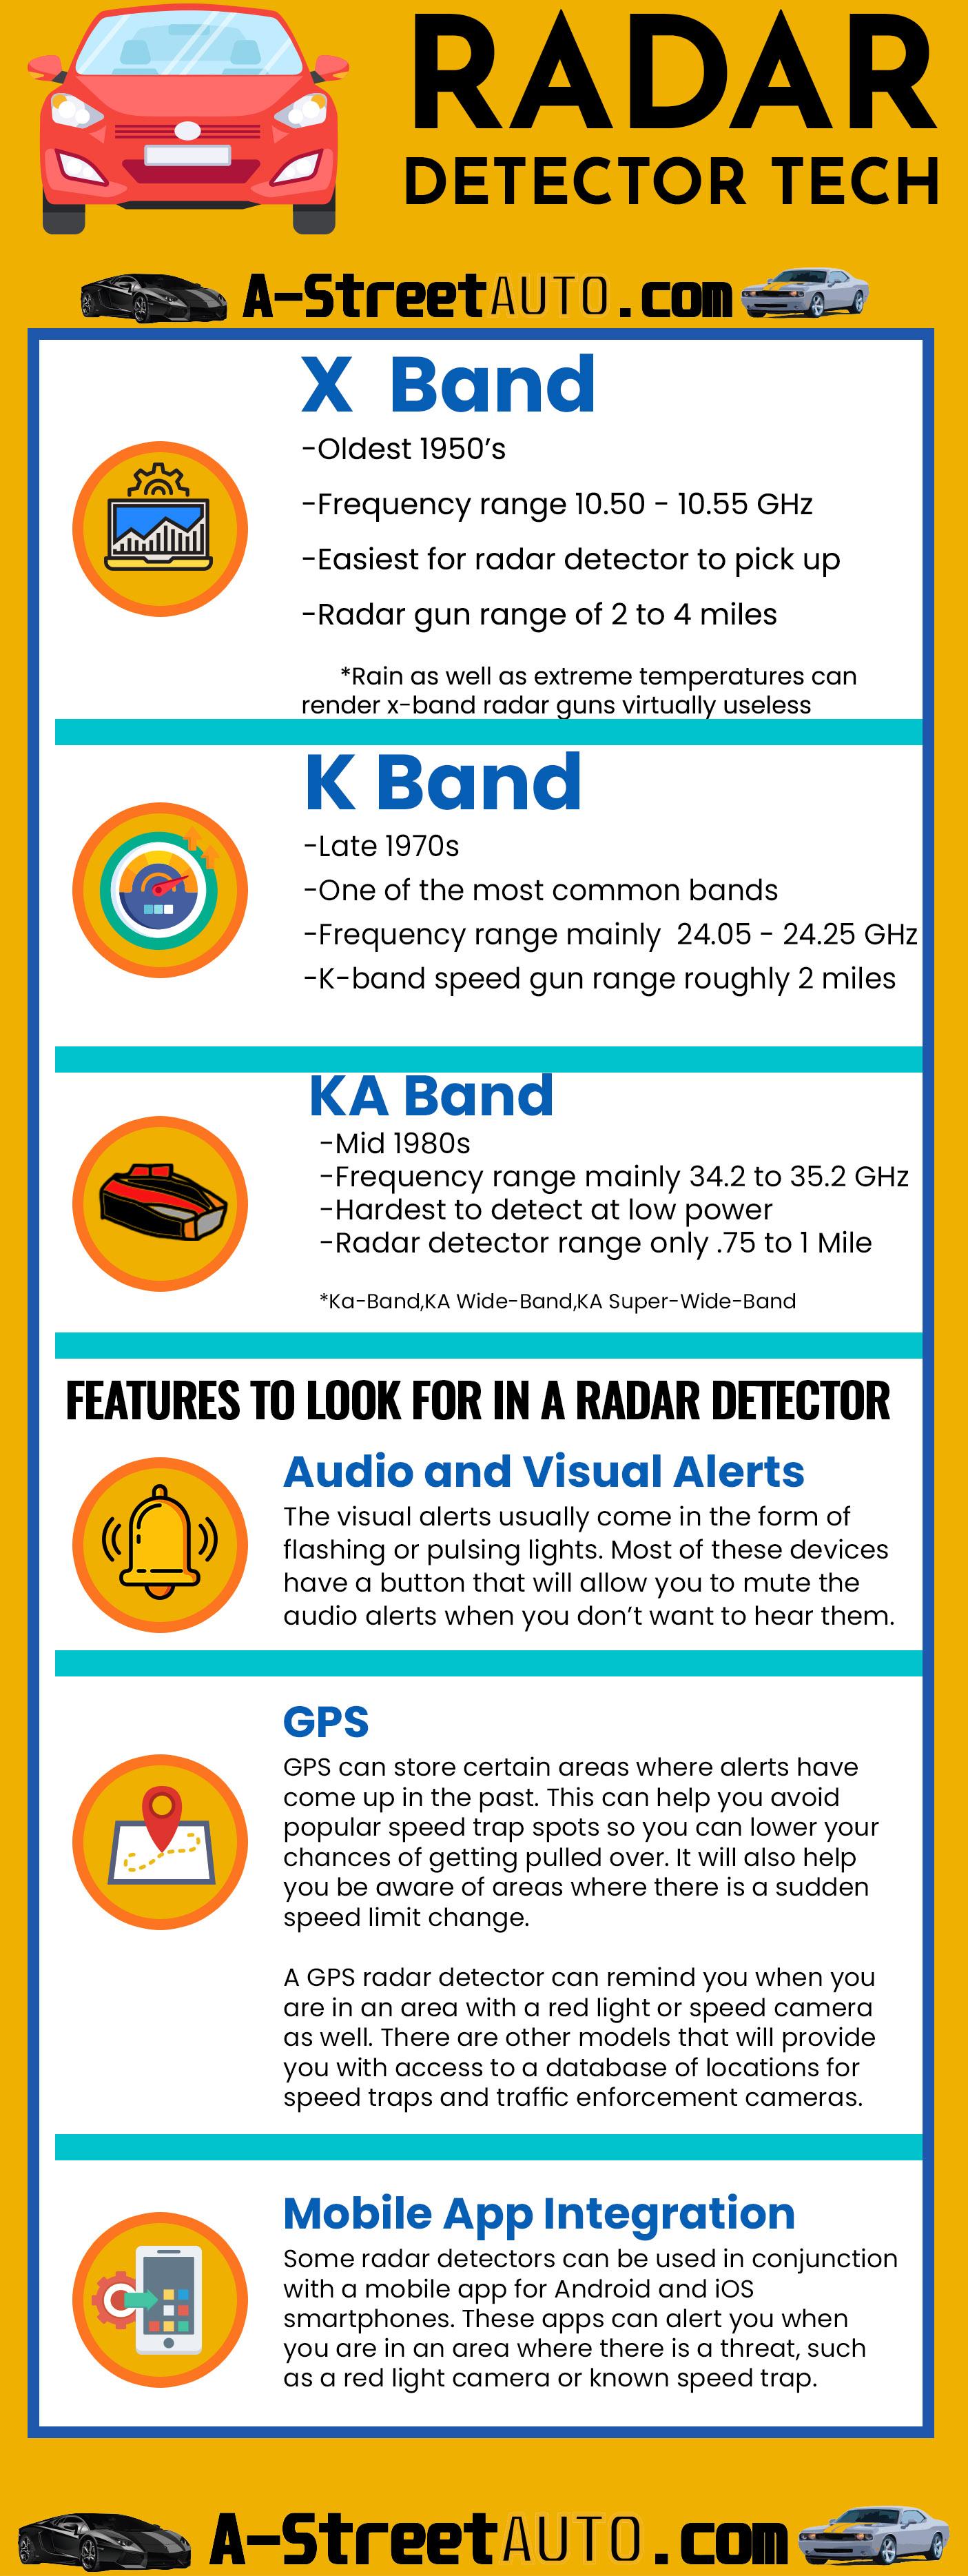 Radar Detector InfoGraphic